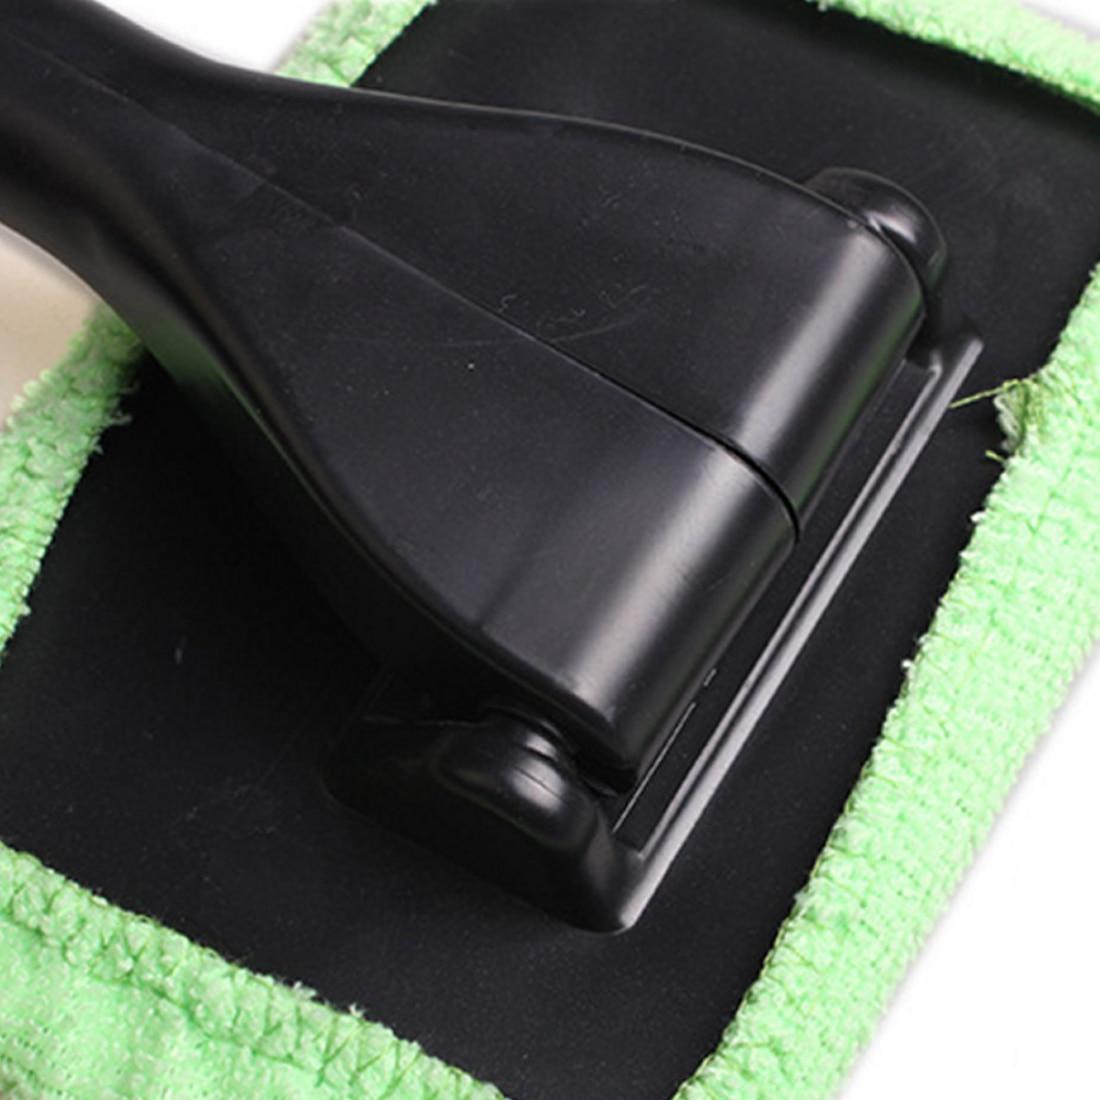 BU-Bauty Window Windshield Wiper Cloth Clean Tool Washable Shine Handy Microfiber Auto Window Cleaner Long Handle Car Wash Brush